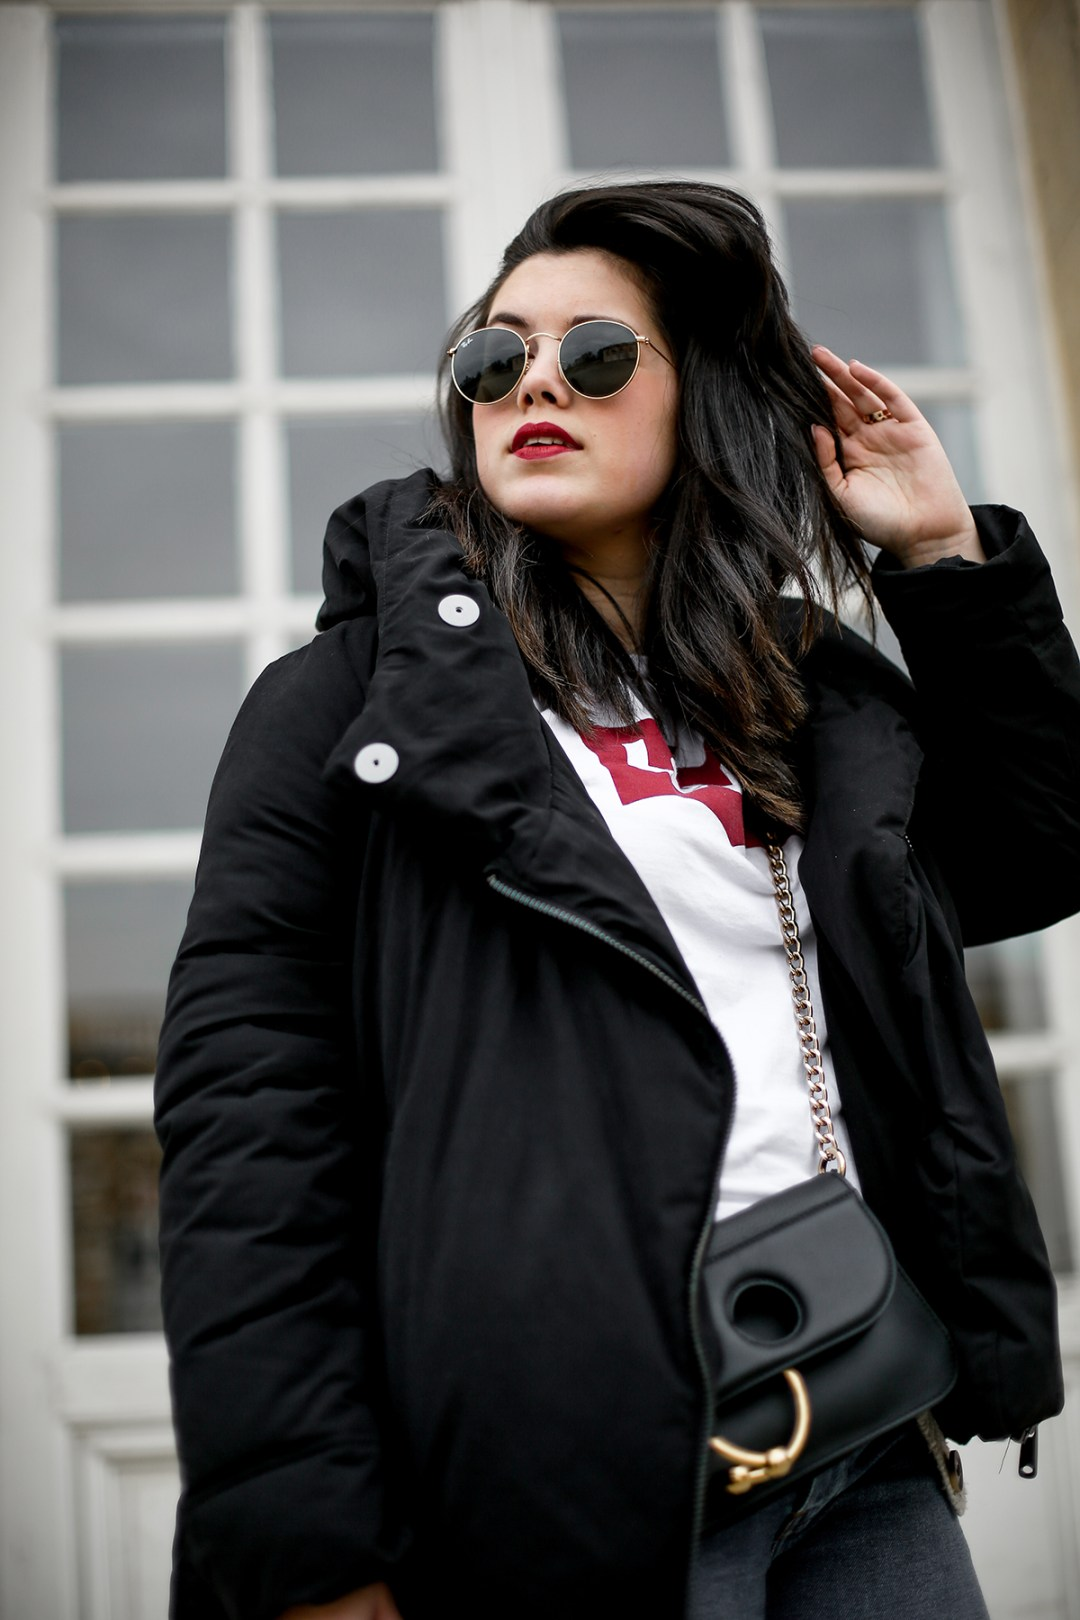 puffer-coat-levis-shirt-basic-505c-jeans-jw-anderson-pierce-bag-how-to-wear8